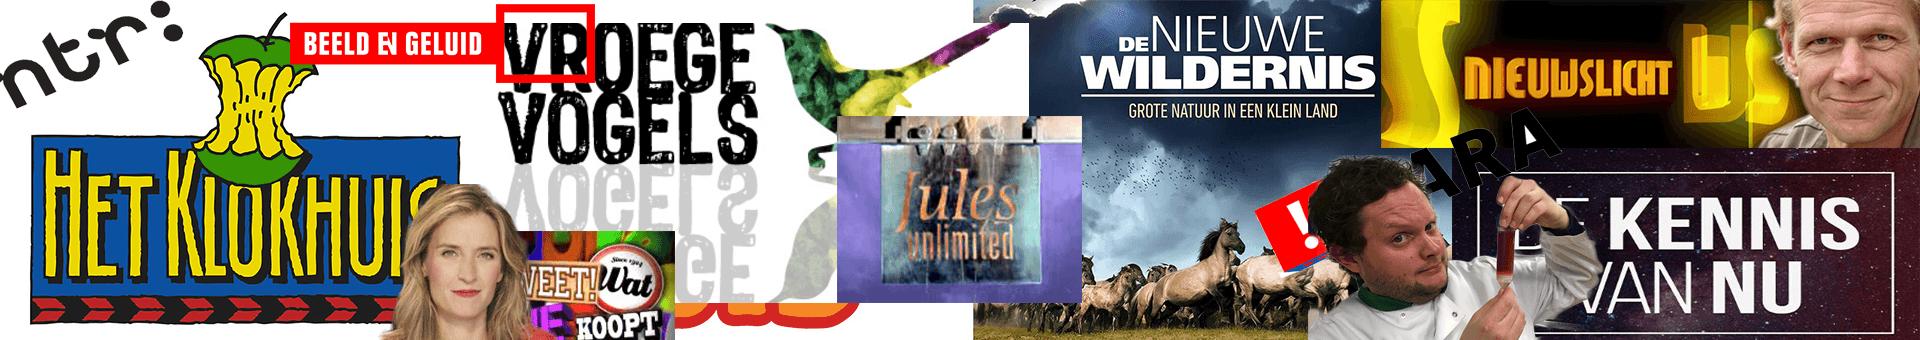 klokhuis, Vroege Vogels, Jules Unlimited , De Kennis van nu, Televisieprogramma's van Roland Postma